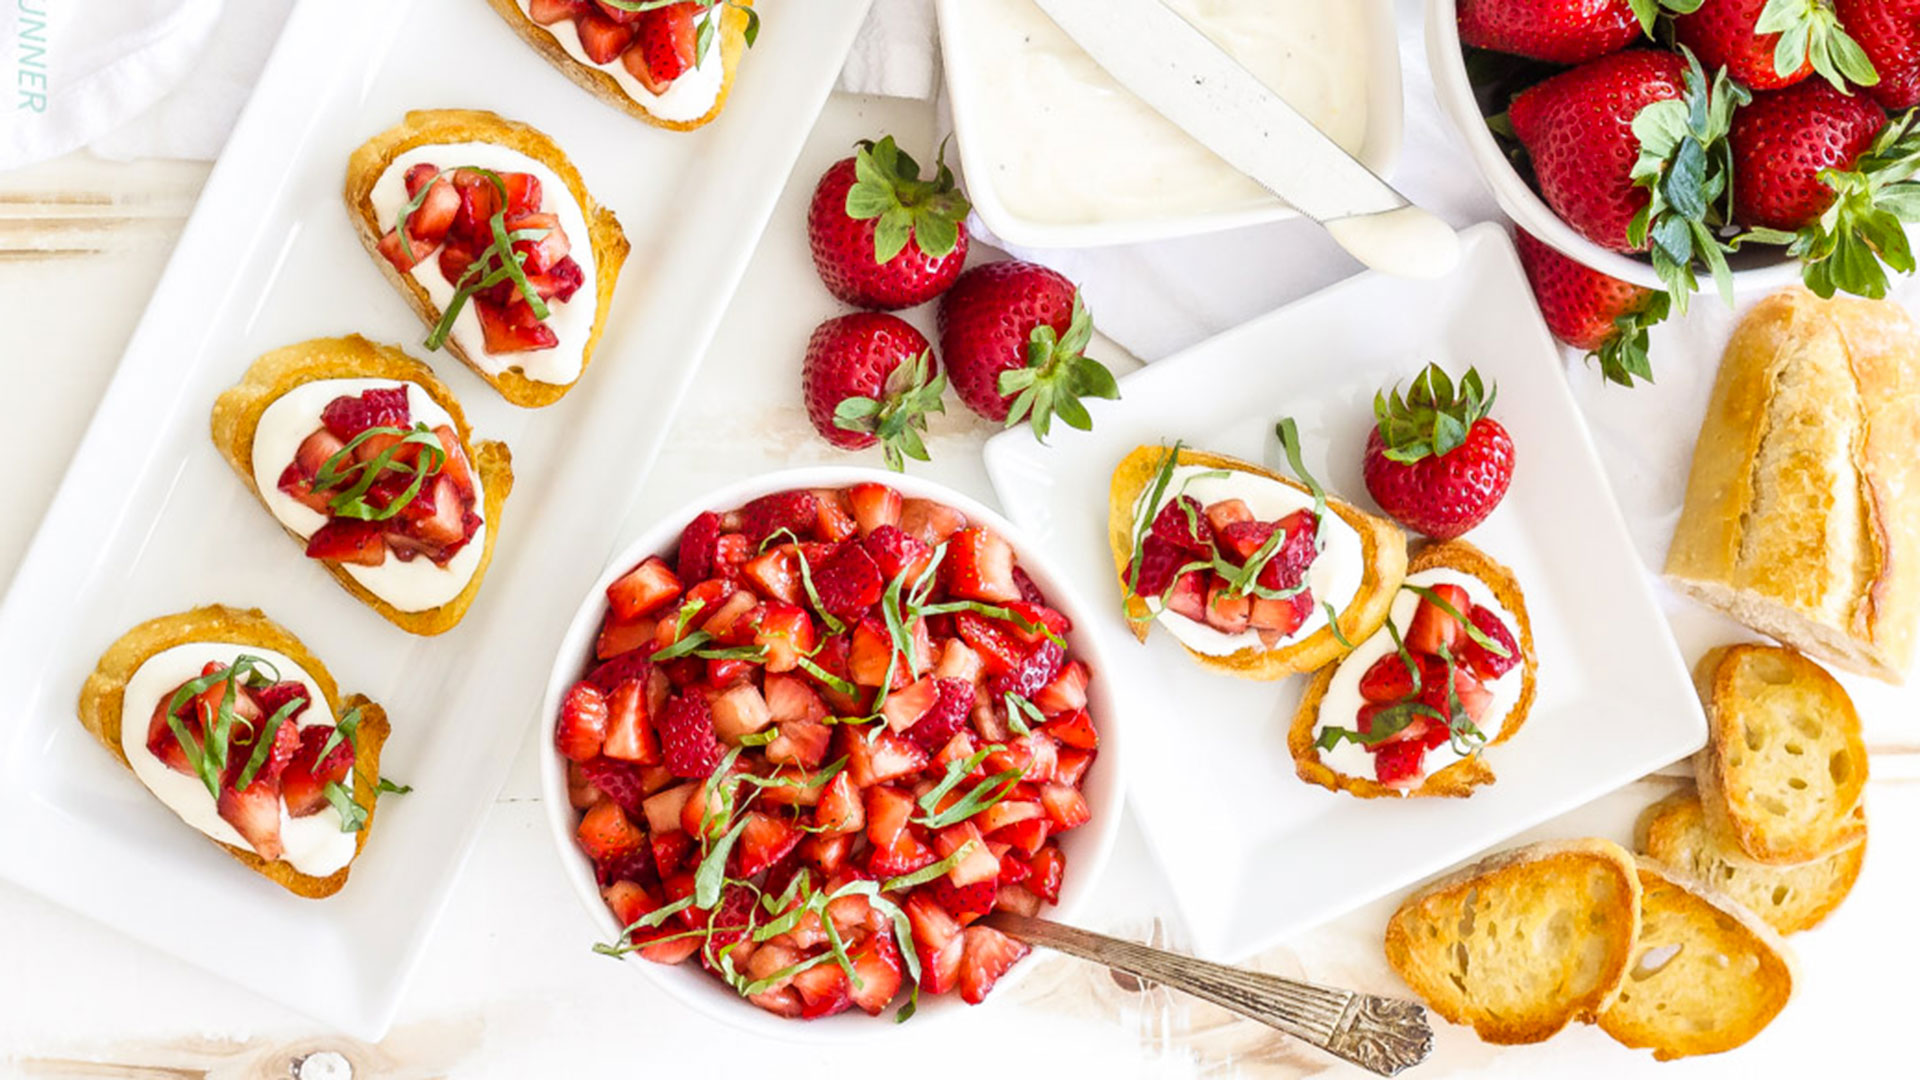 STYLECASTER | Savory Dessert Recipes